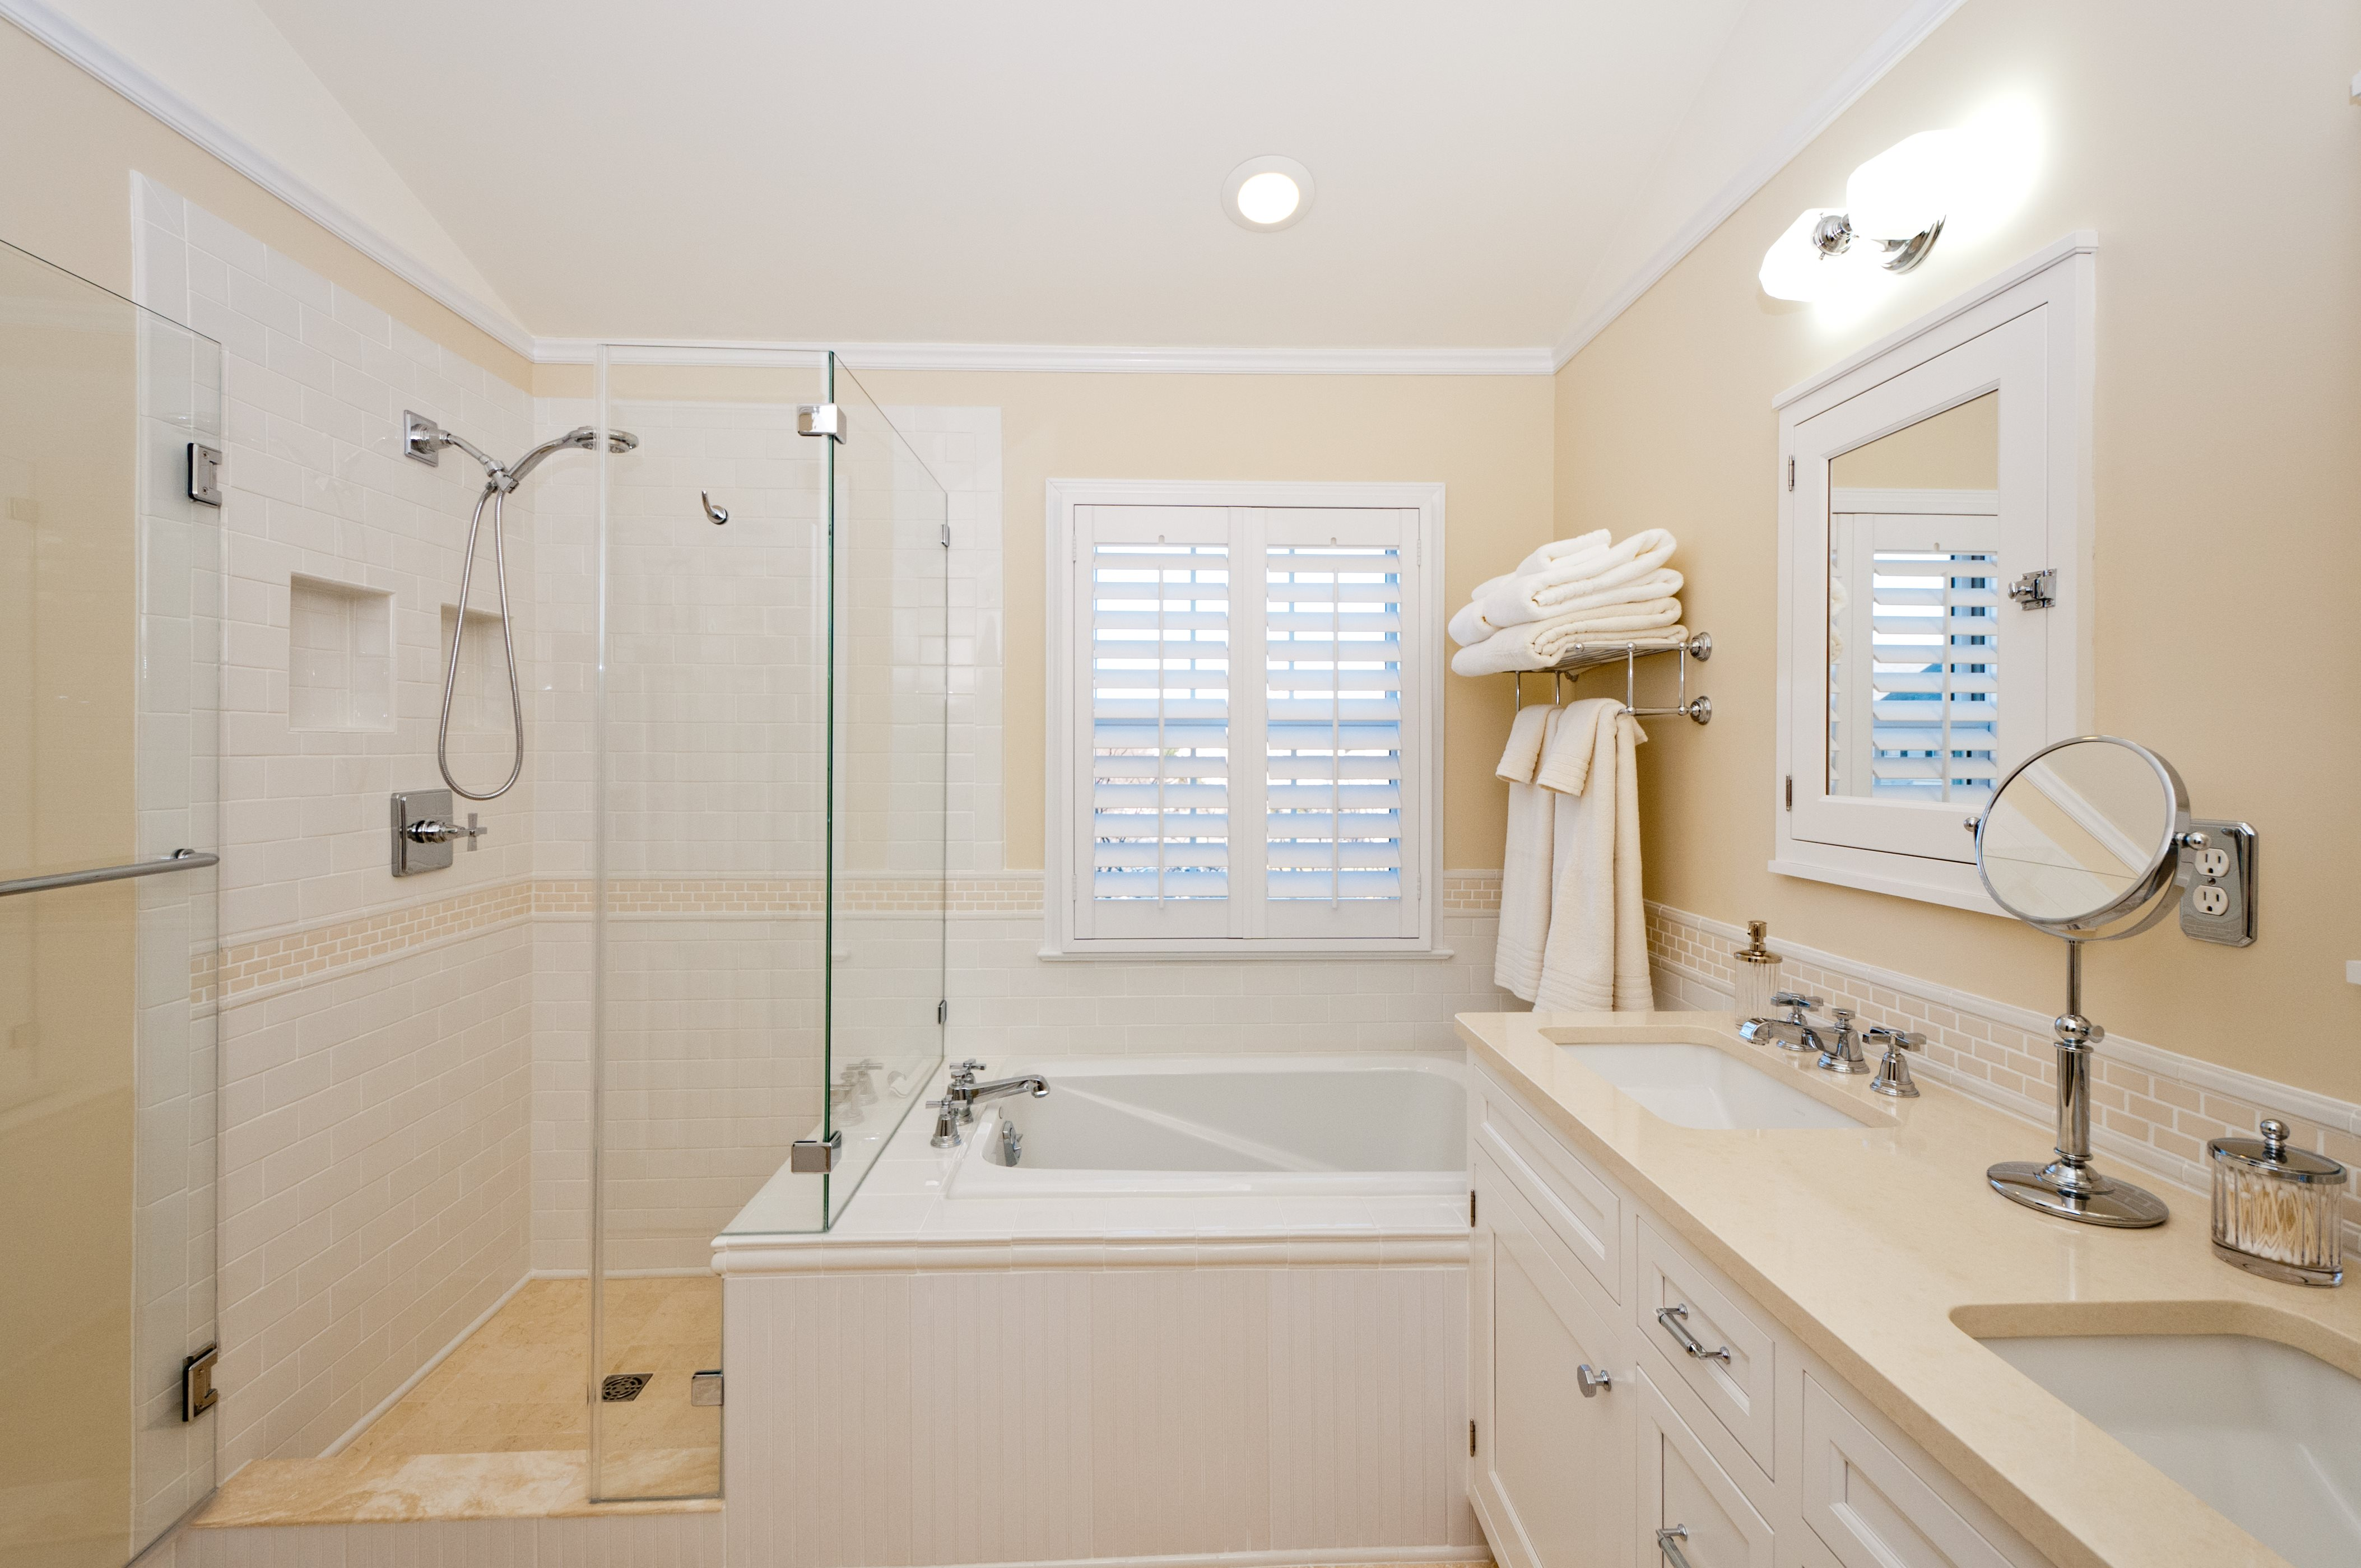 Bathtubs16.jpg